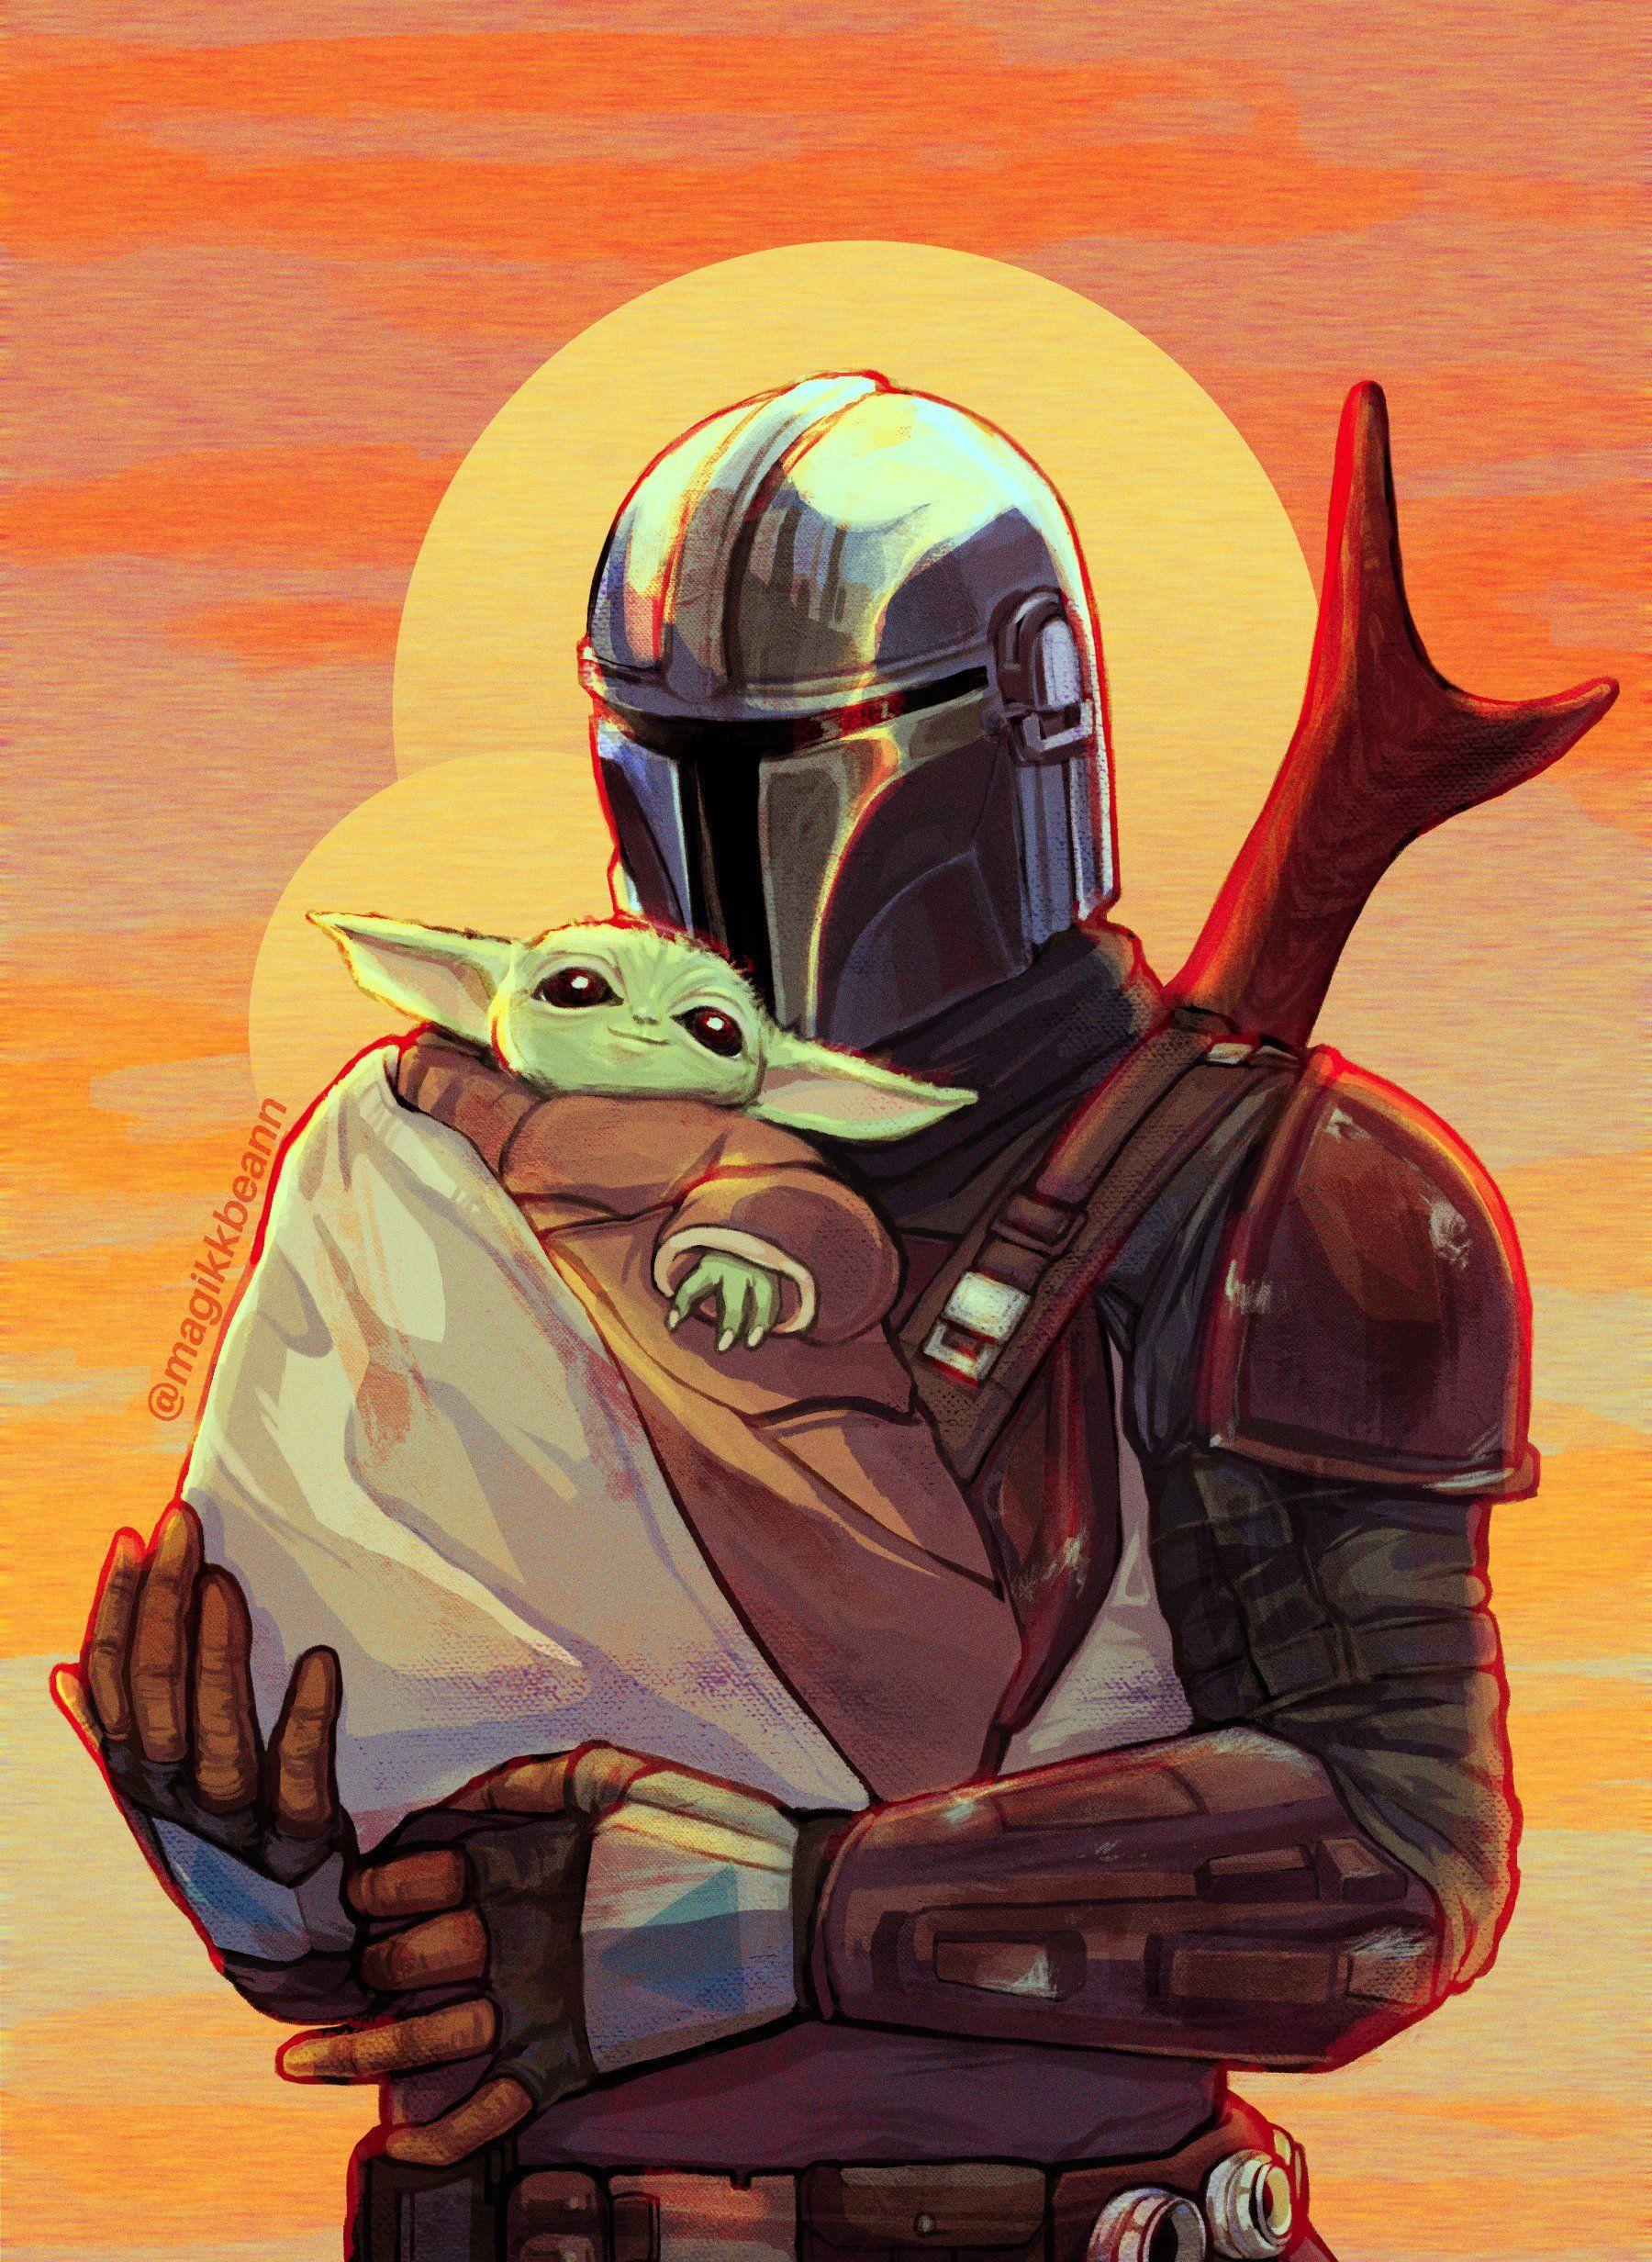 Mandalorian And Baby Yoda Wallpapers ...